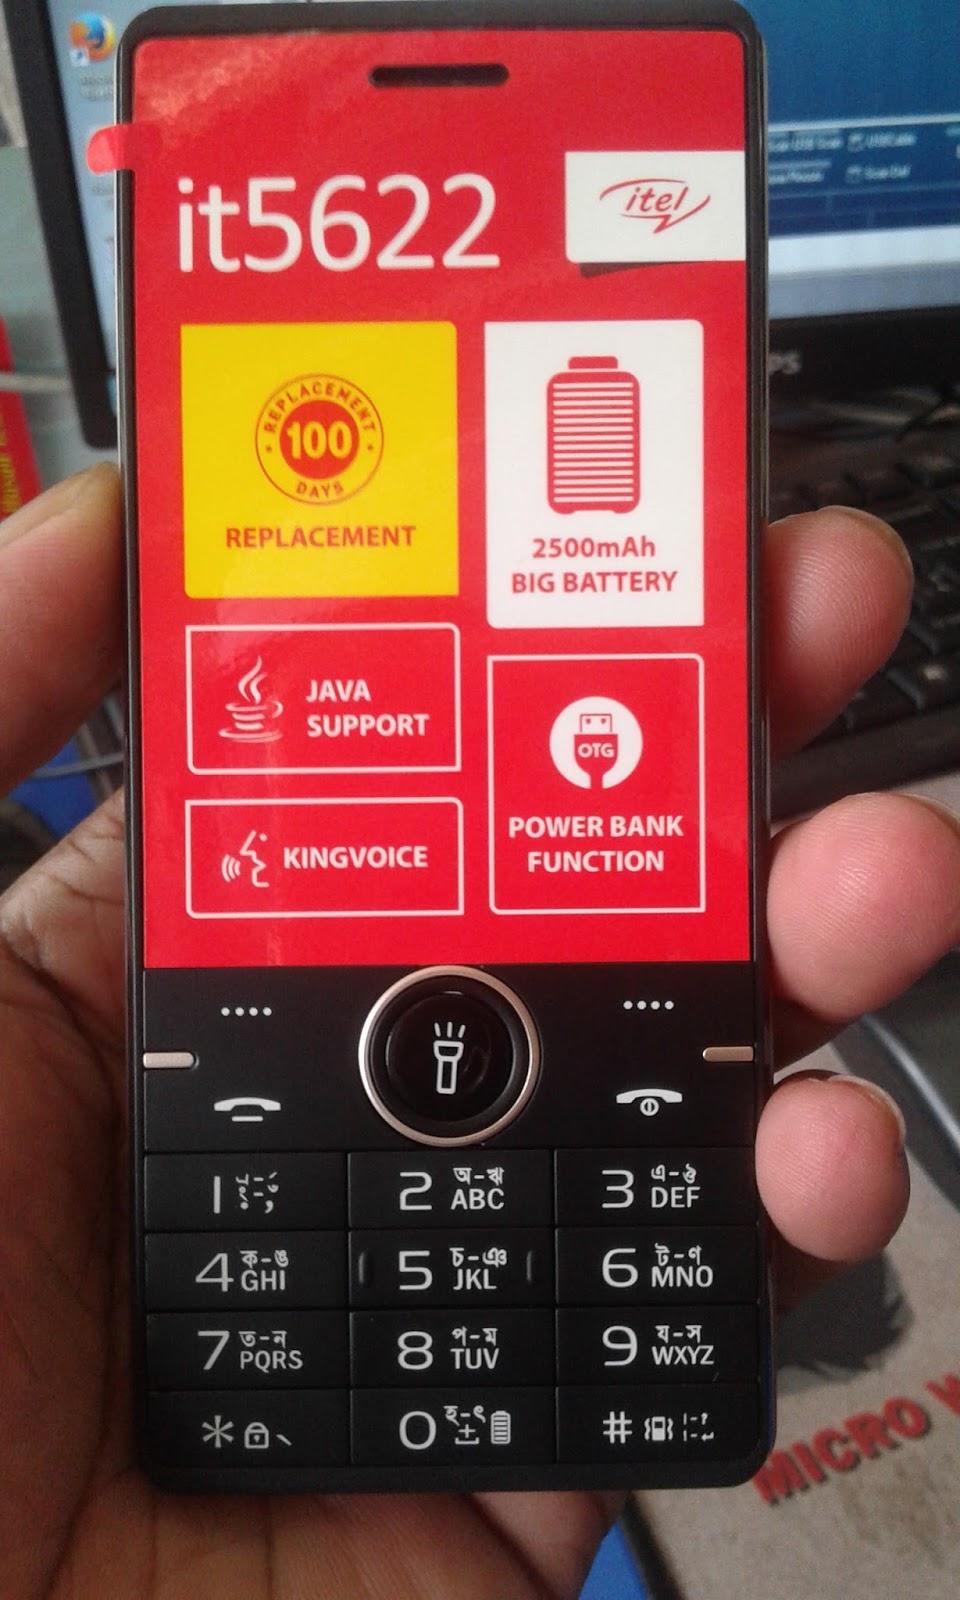 MADINA TELECOM: itel it-5622 FLASH FILE 100% TESTED BY